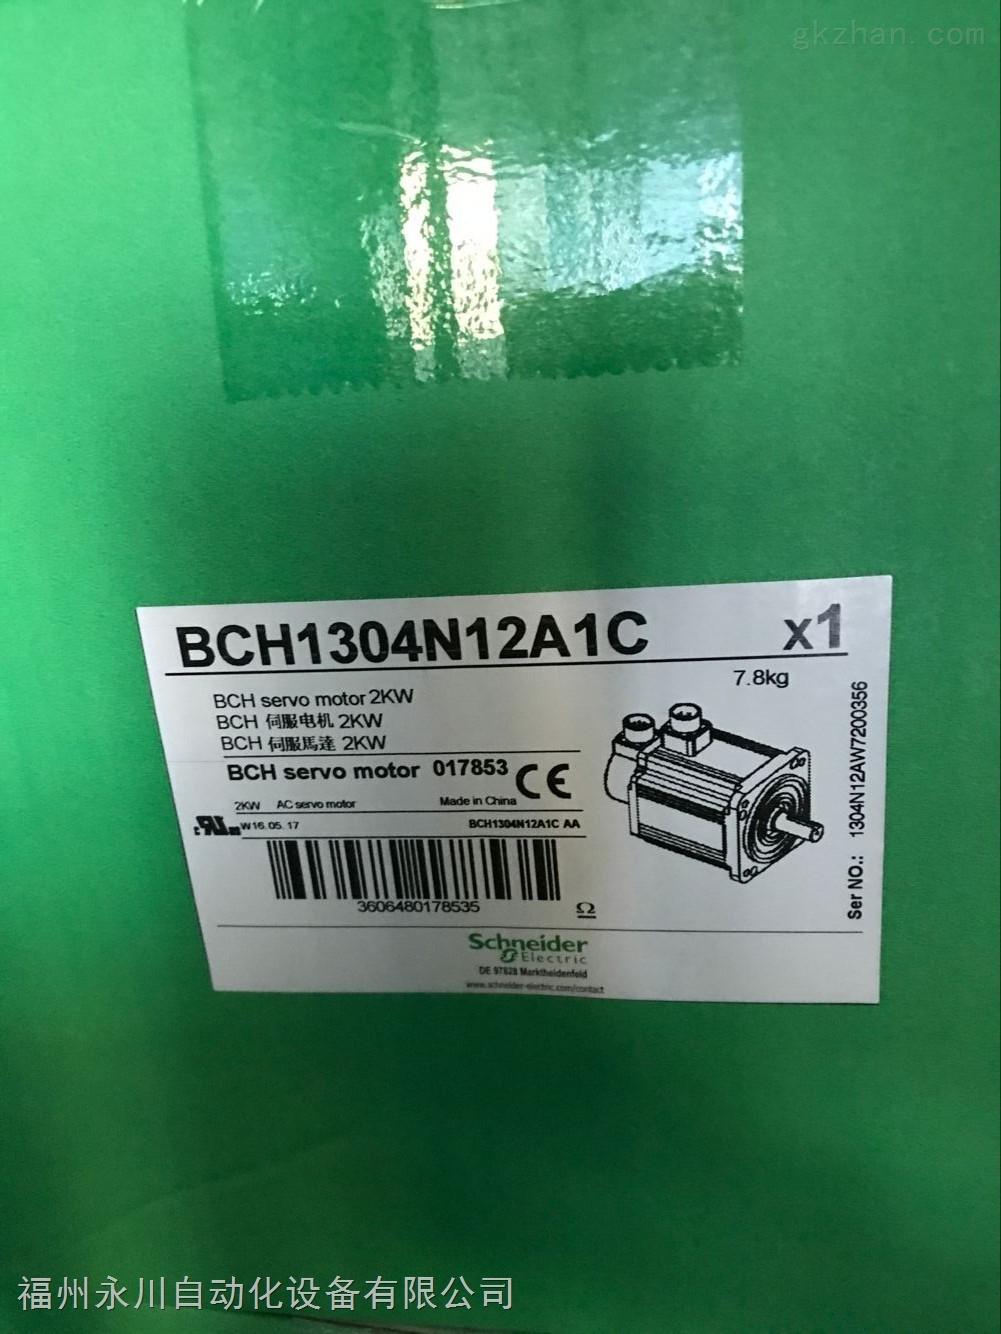 BCH1804M12A1C福州永川-施耐德伺服电机一级代理